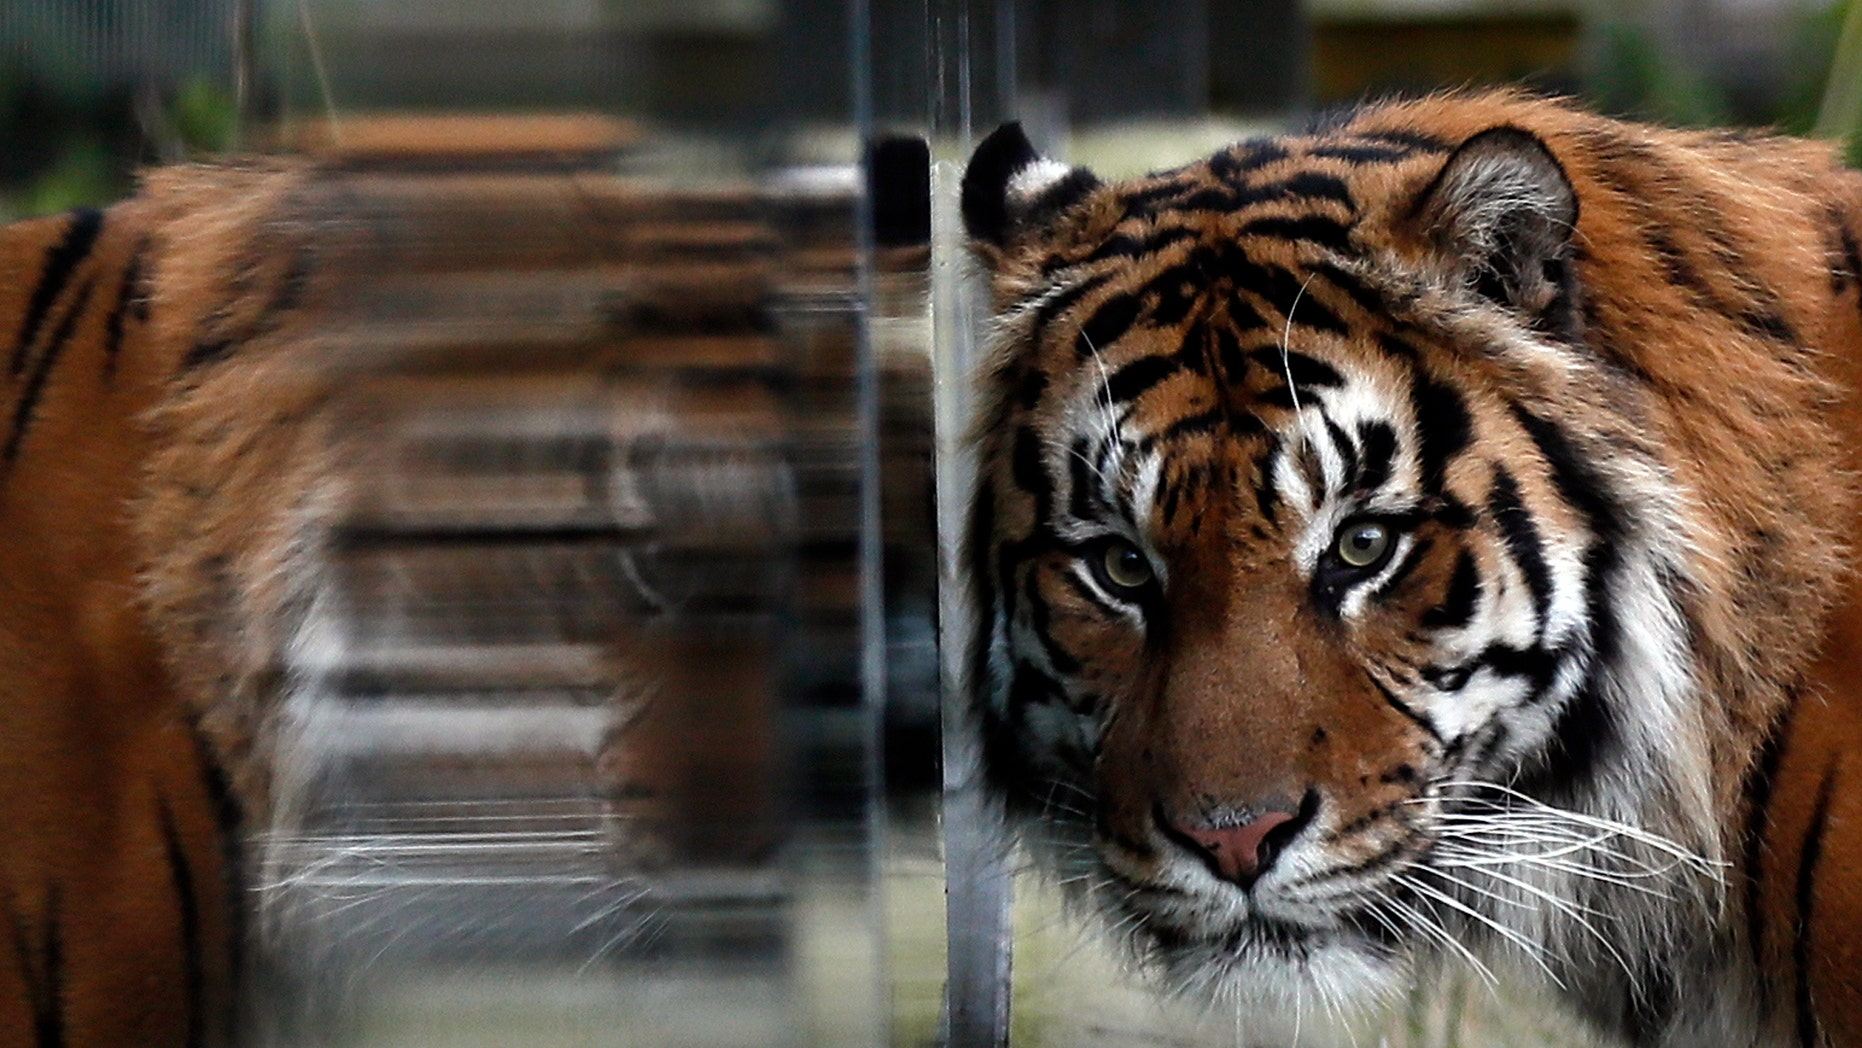 Tiger Jae Jae is reflected in glass at London Zoo in London, Britain, Jan. 3, 2017.